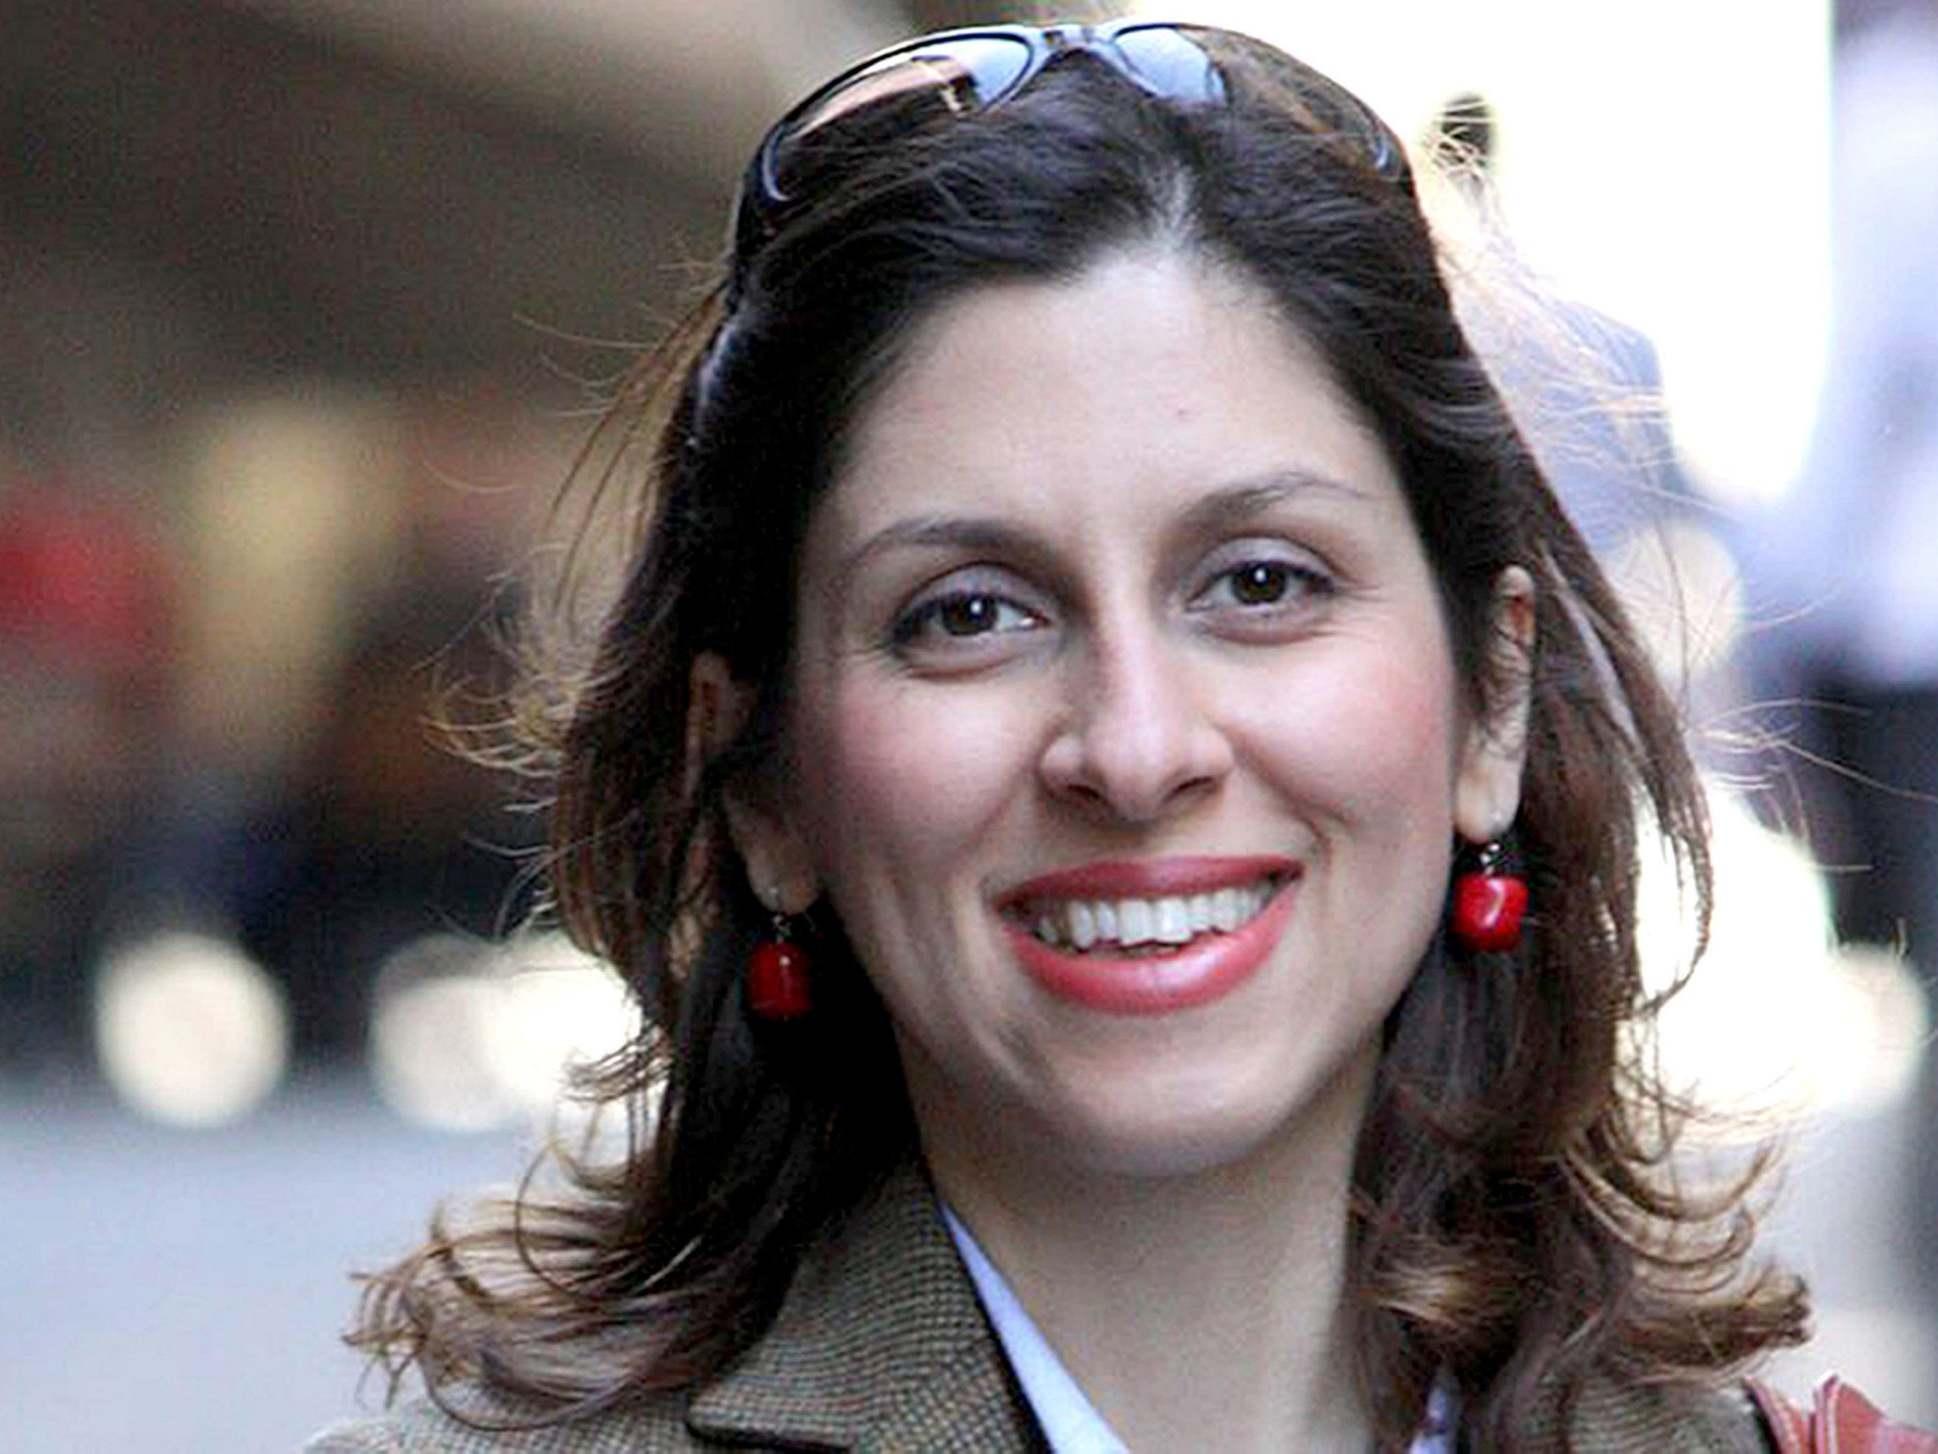 Nazanin Zaghari-Ratcliffe released from Iran prison